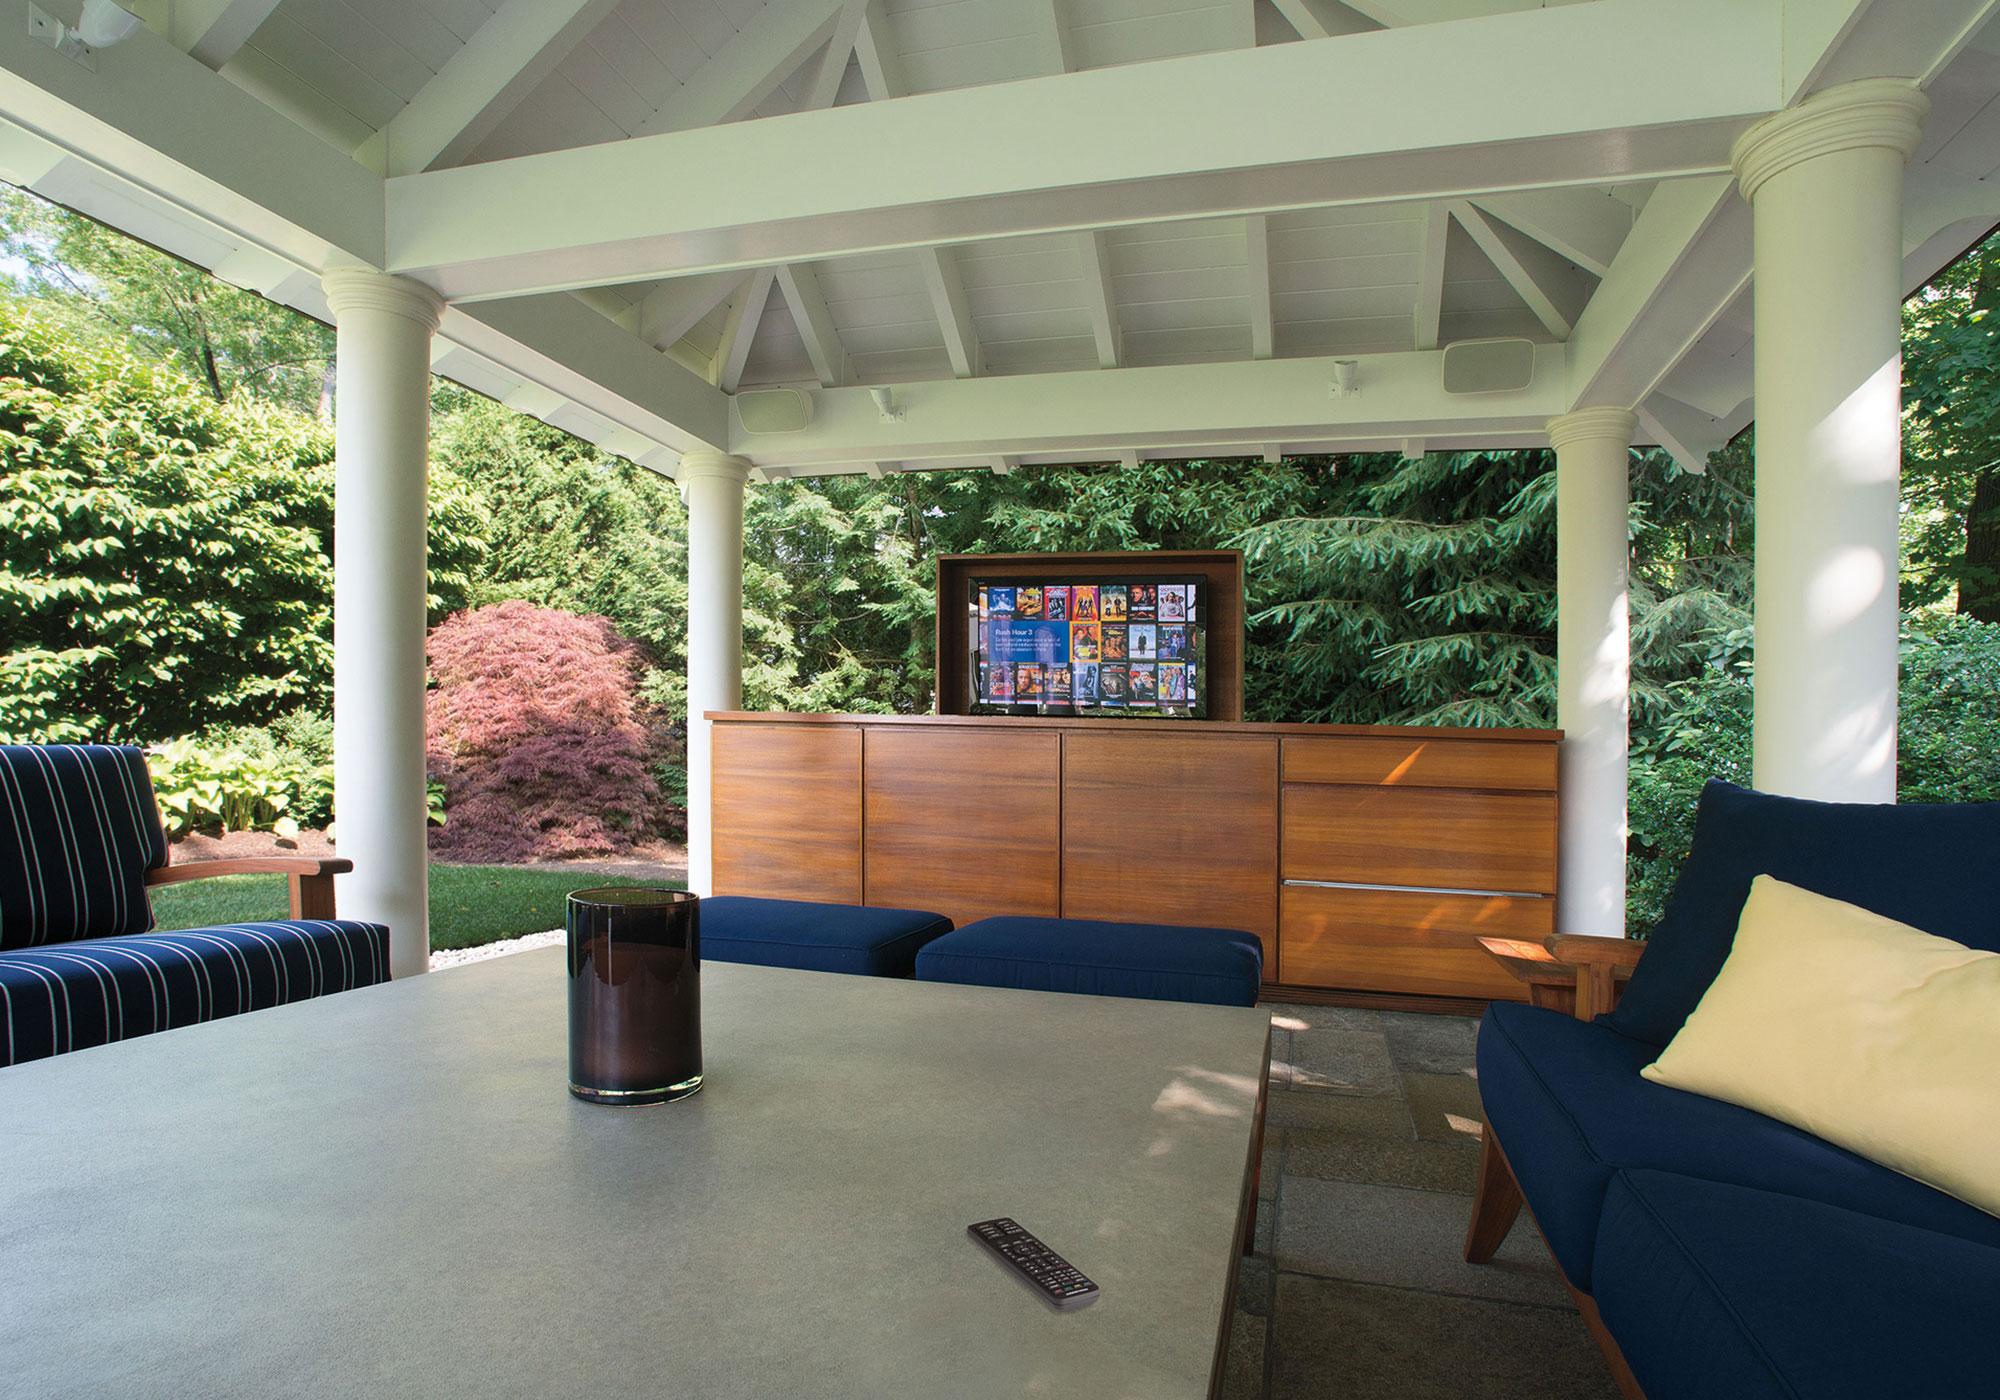 patio, tv, waterproof tv, lift, cabinetry, millwork, handheld remote